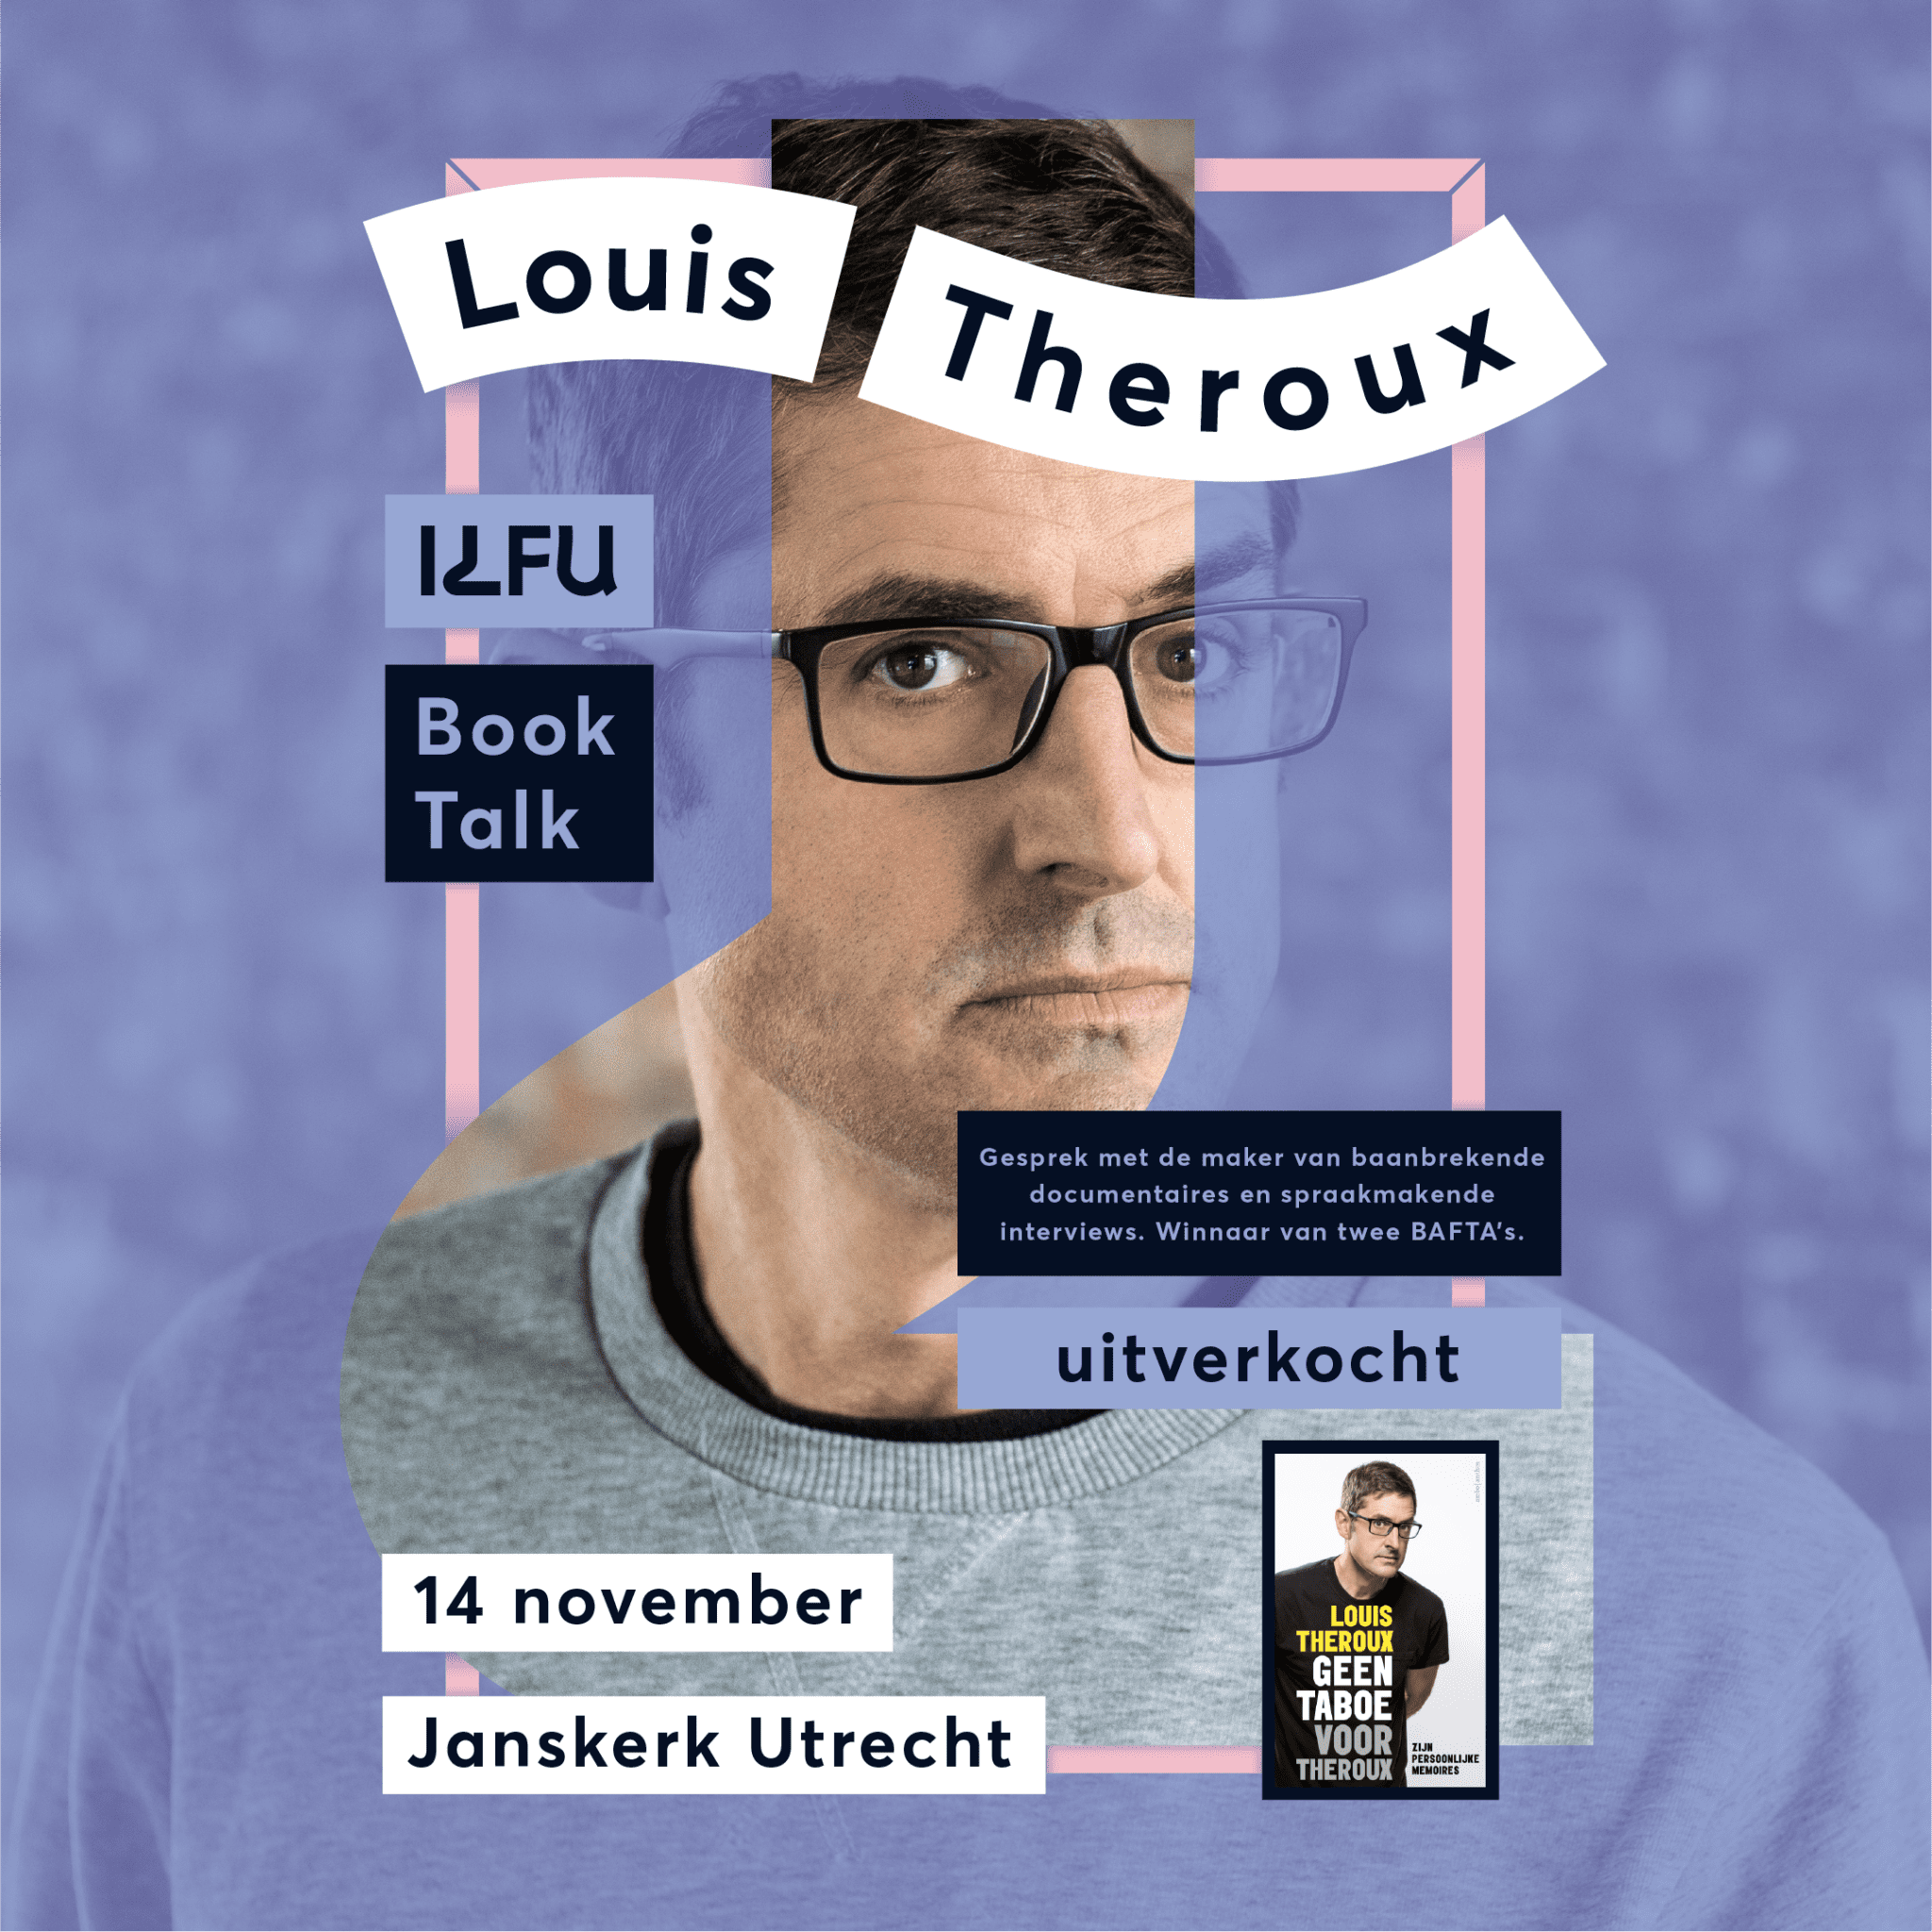 ILFU-Instagram-BookTalk-Theroux